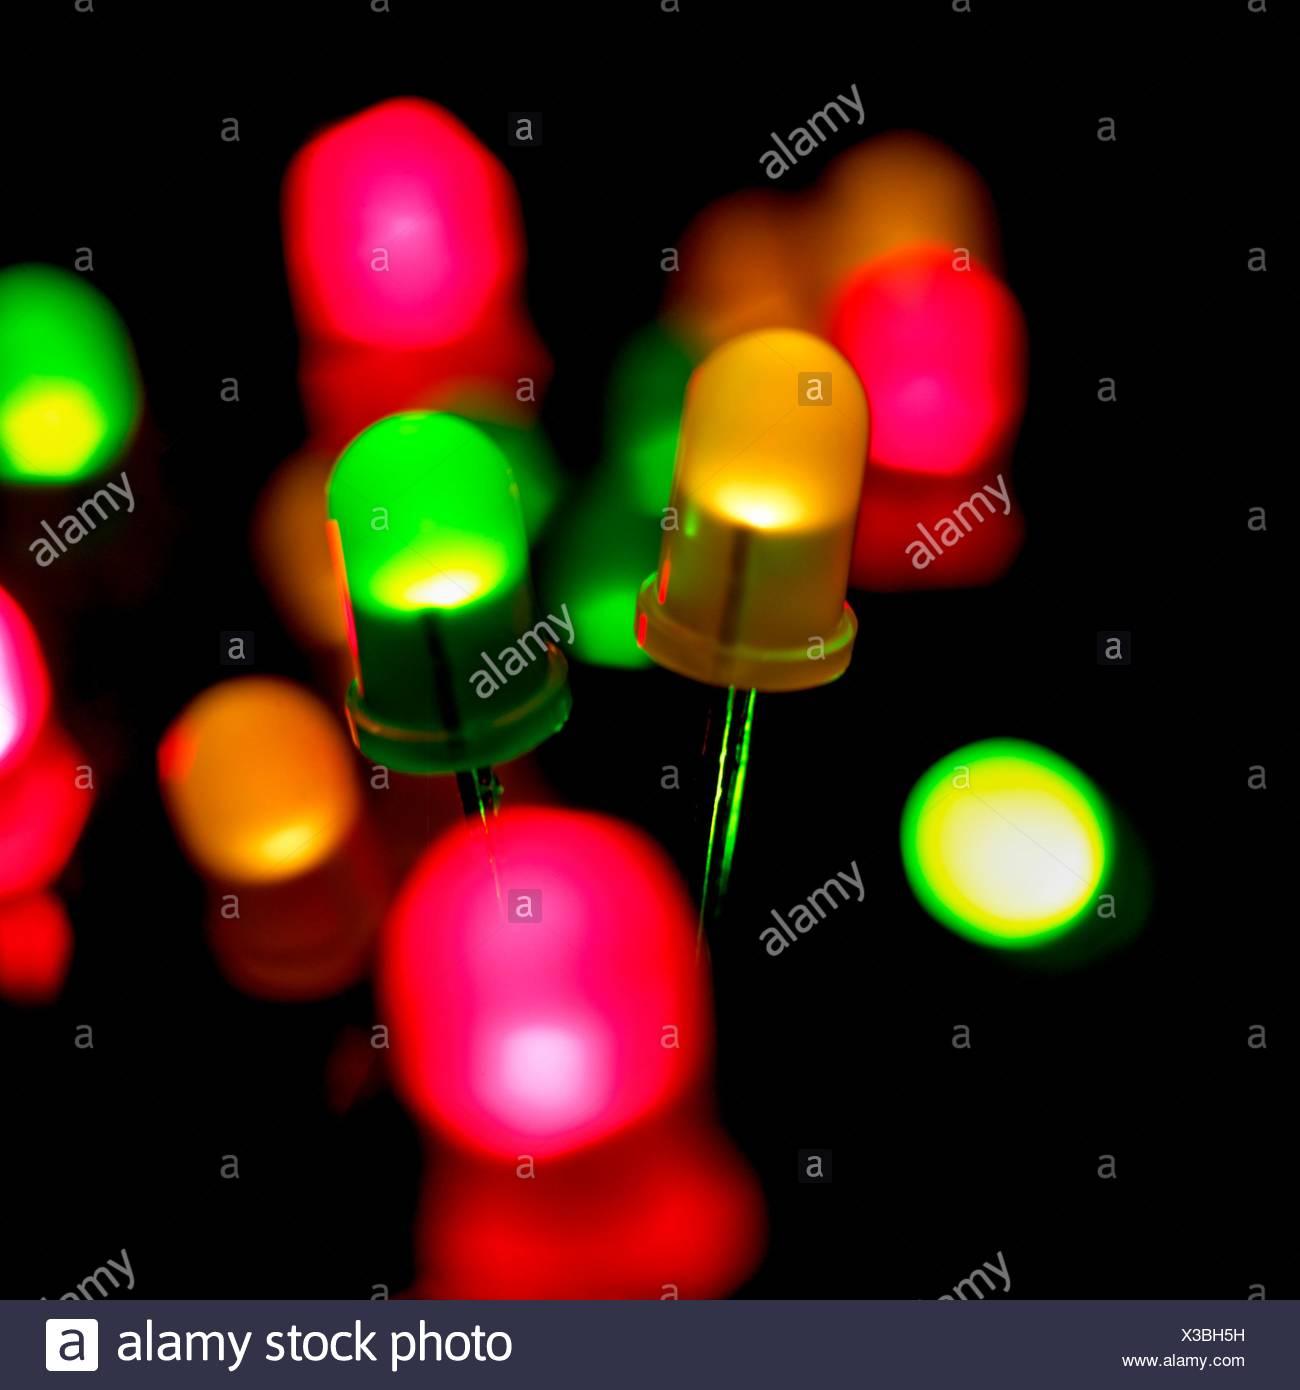 Coloured Light Emitting Diodes (LEDs) Against A Black Background.